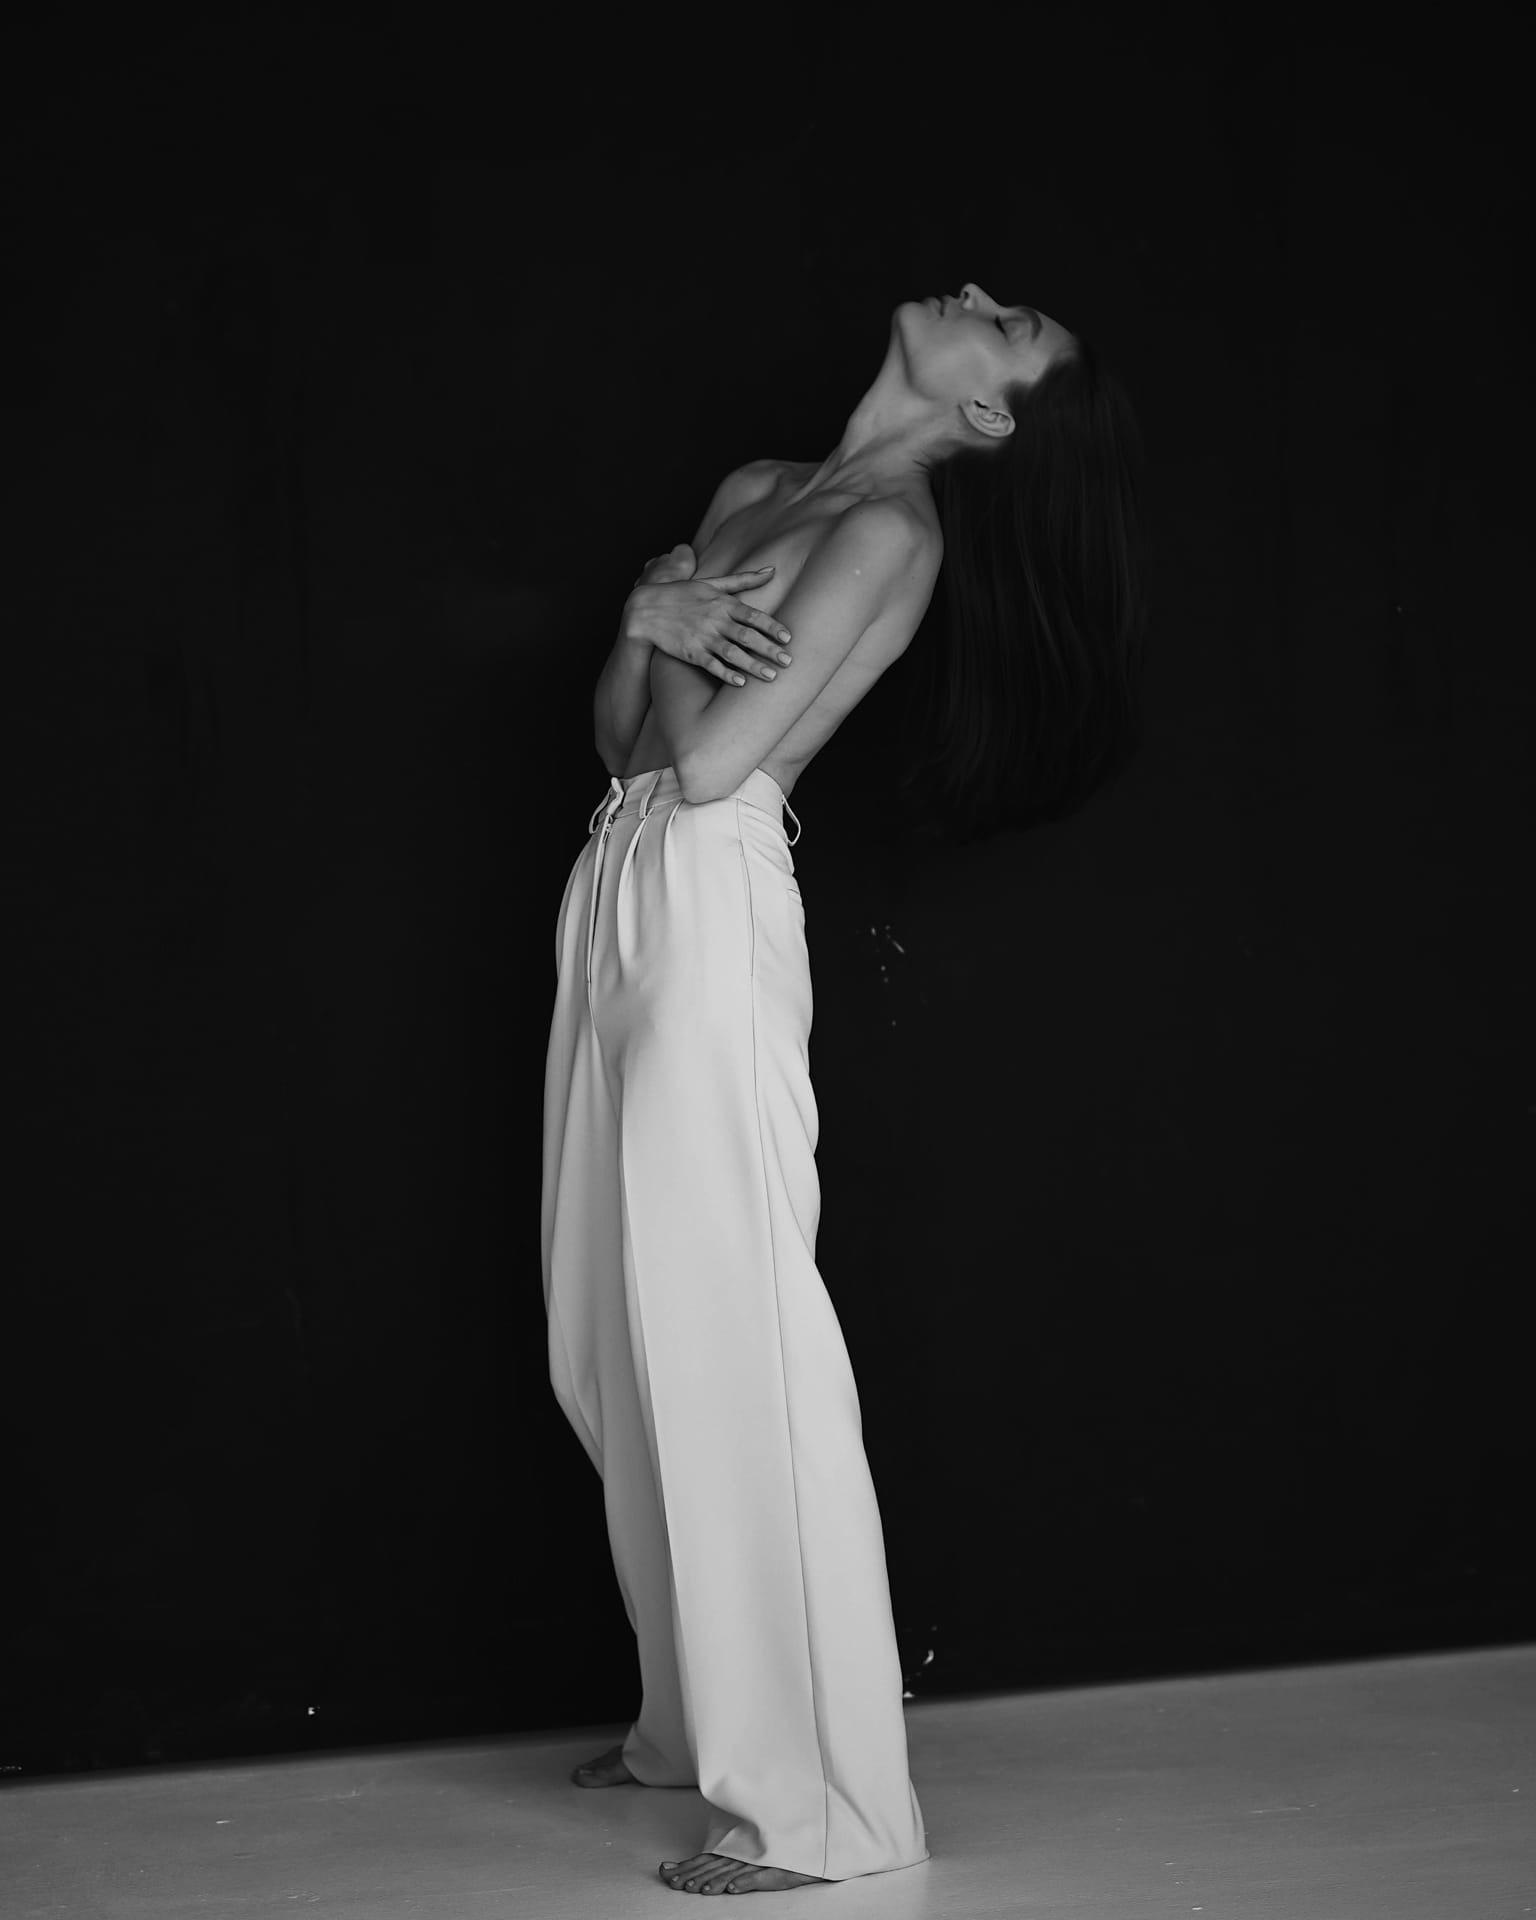 https://www.youngfolks.ru/pub/photographer-daria-bant-114058